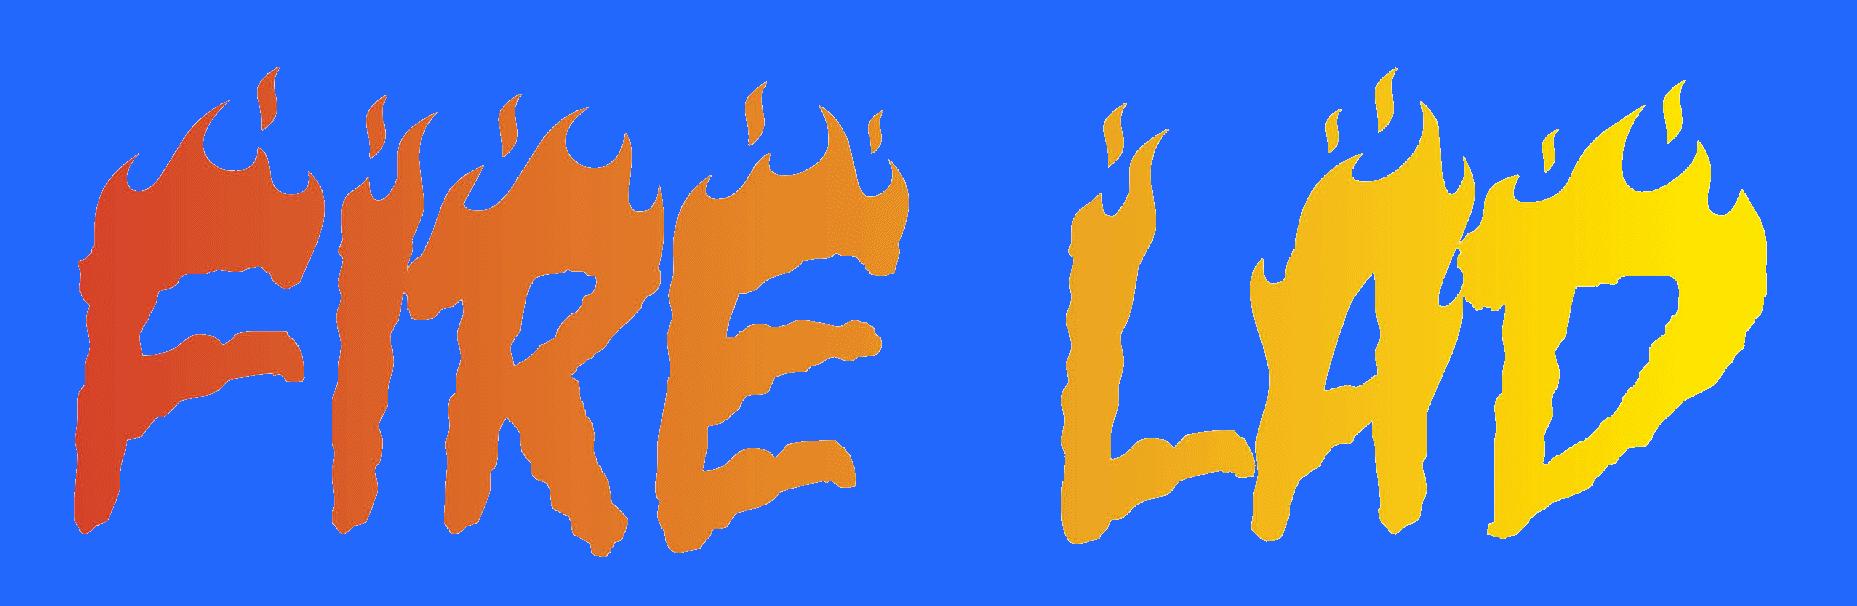 Fire Lad